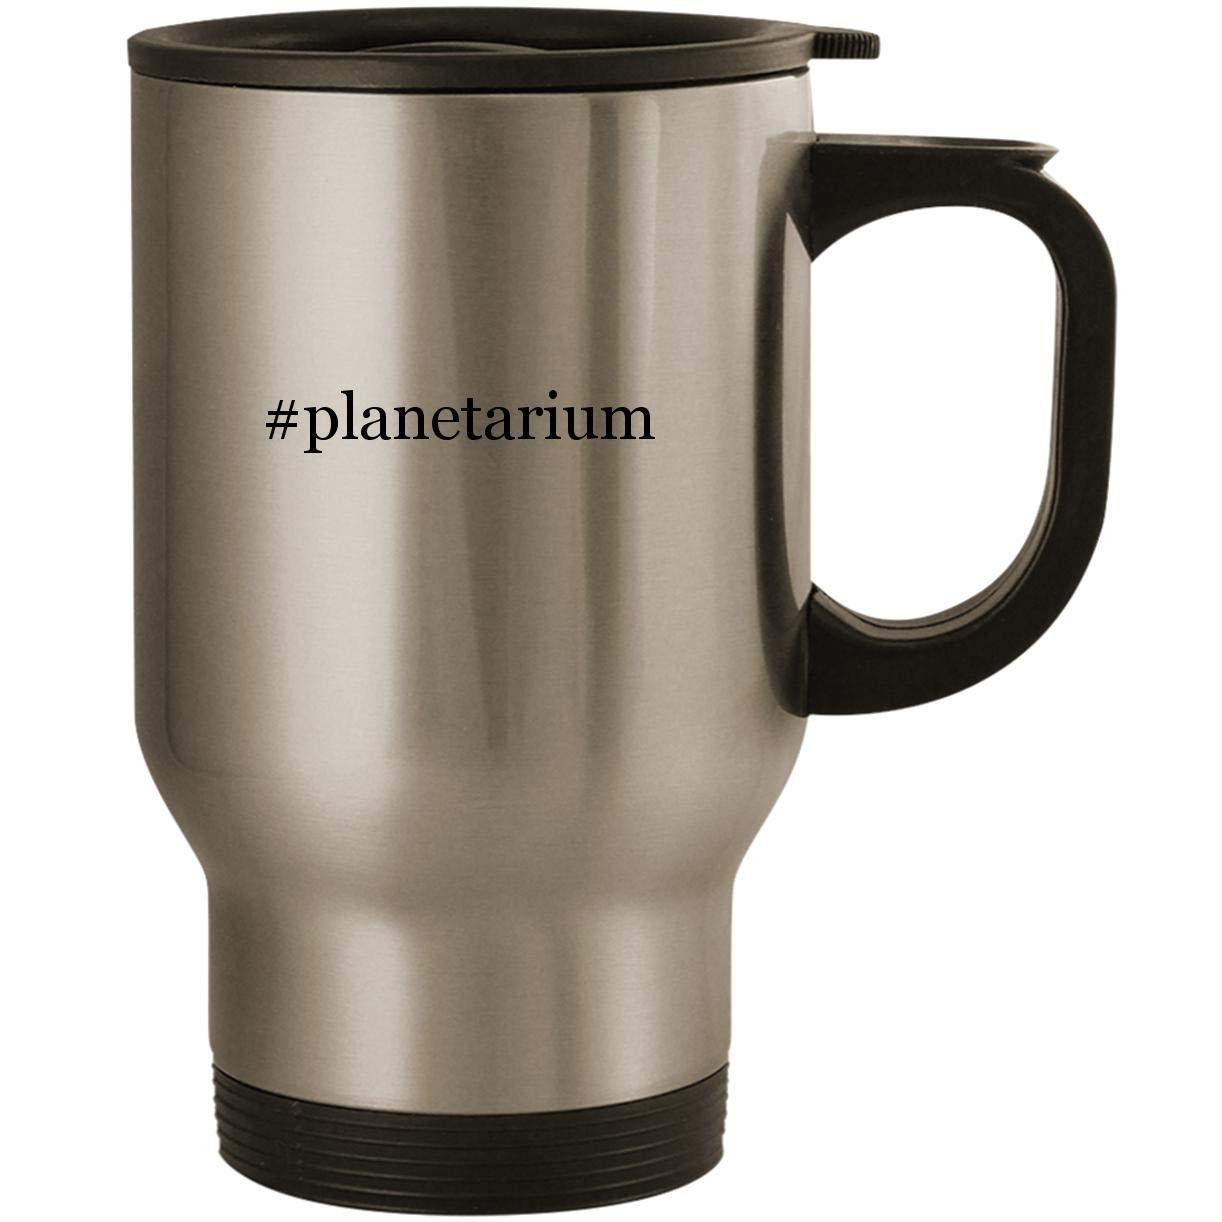 #planetarium - Stainless Steel 14oz Road Ready Travel Mug, Silver